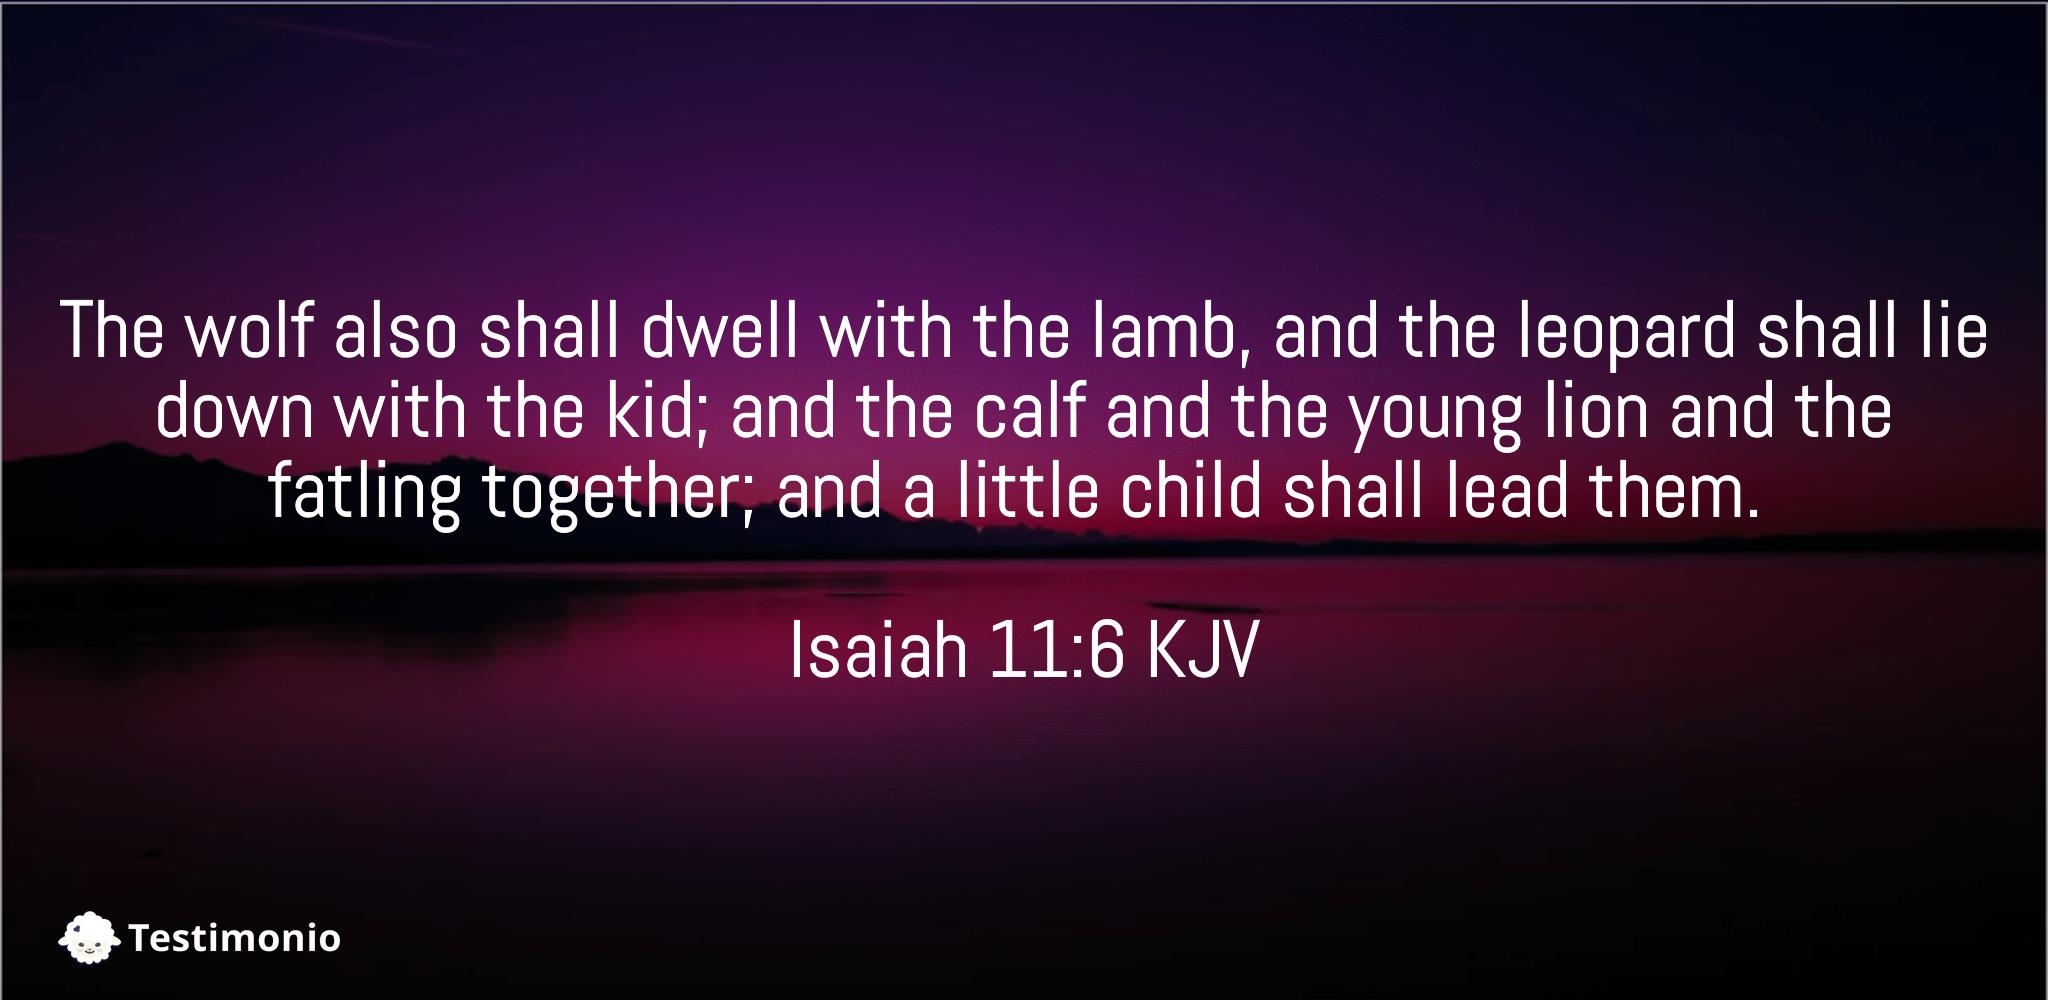 Isaiah 11:6